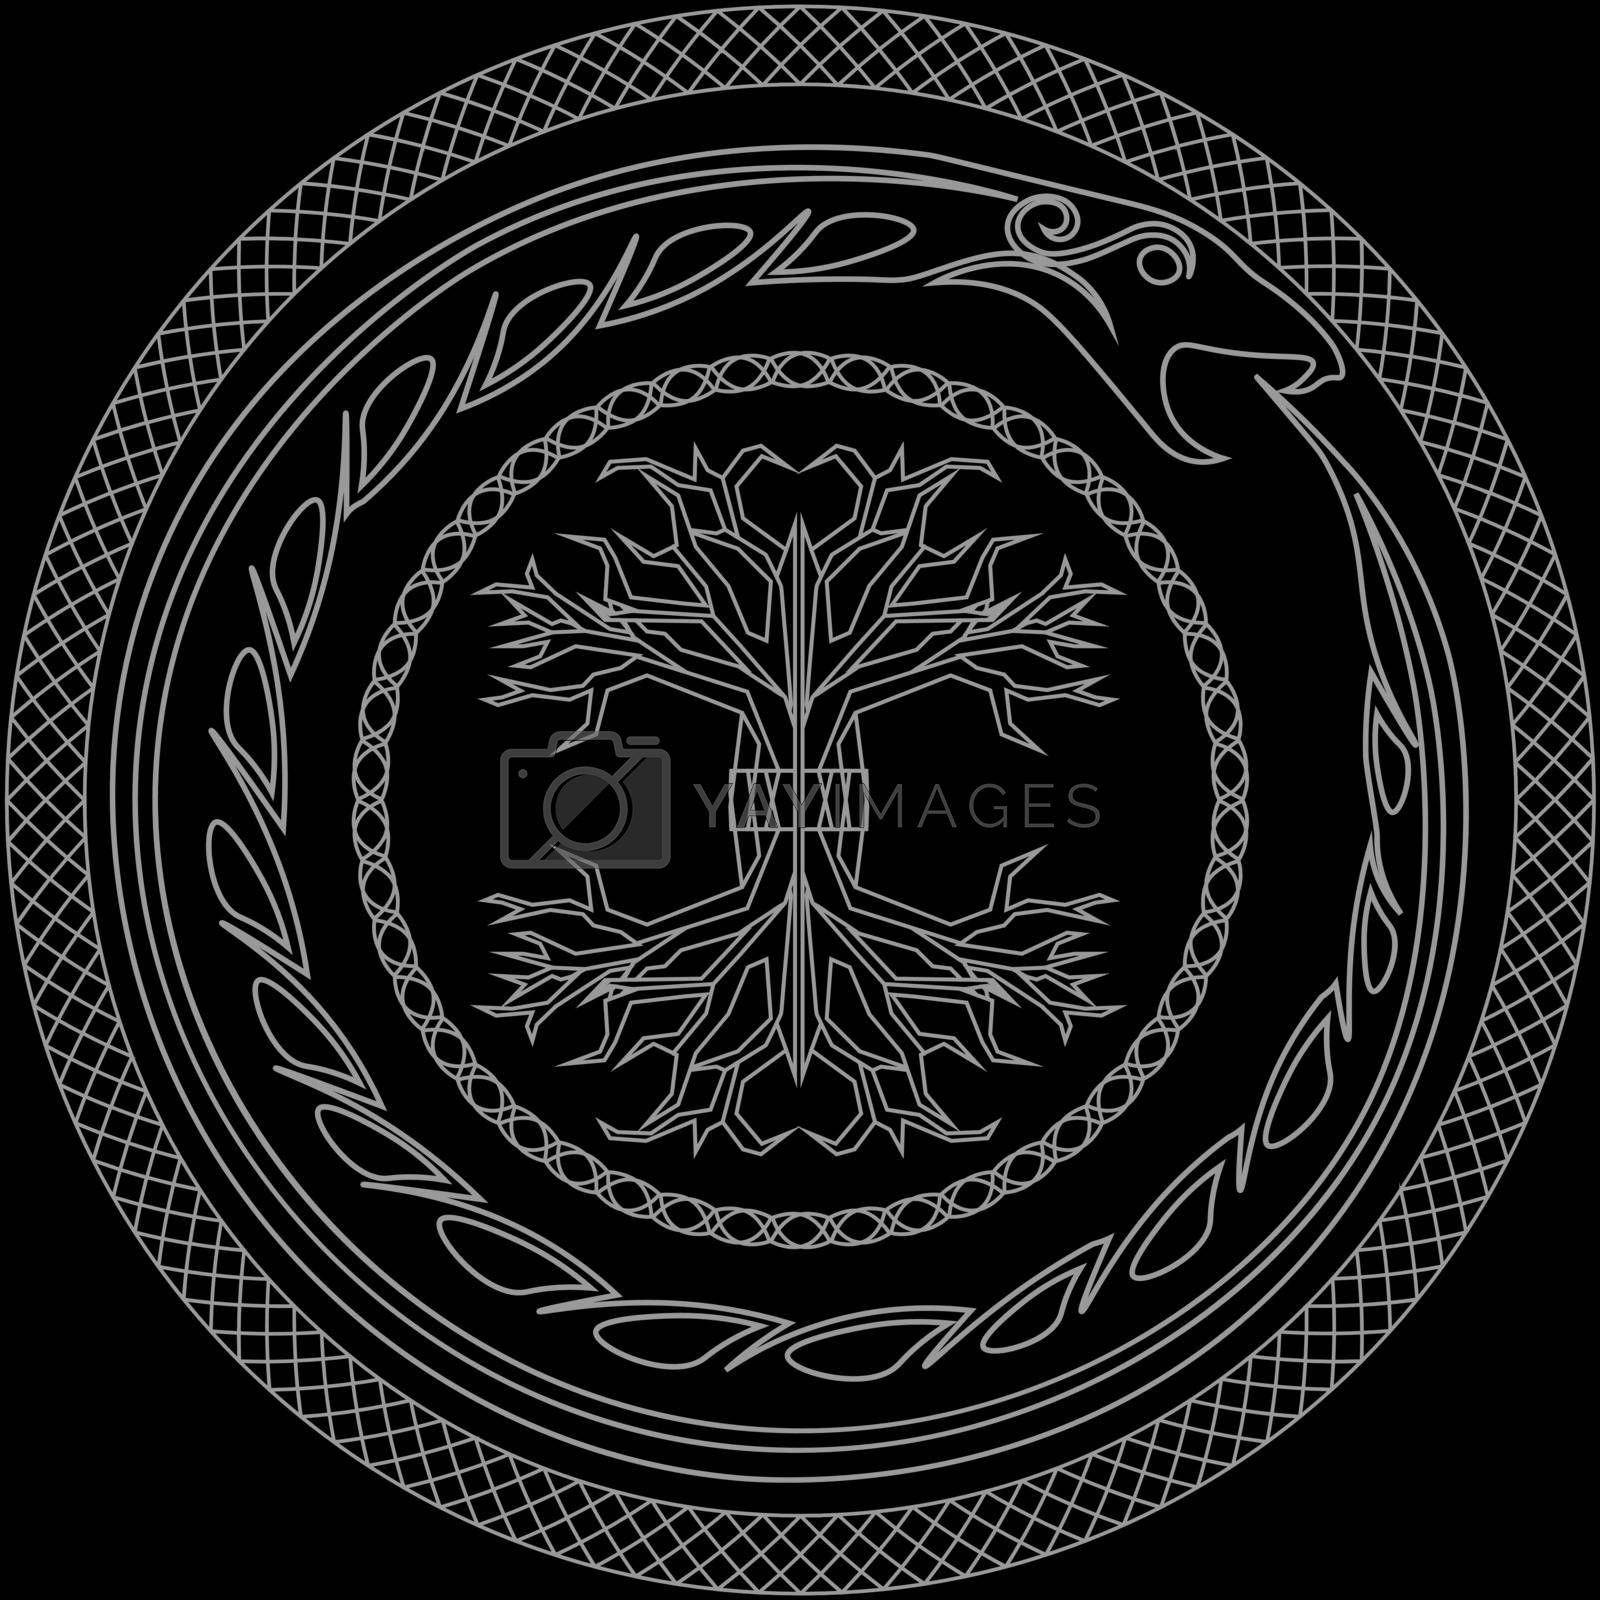 Contour old scandinavian pagan symbols yggdrasil and ouroboros in ornamented circles